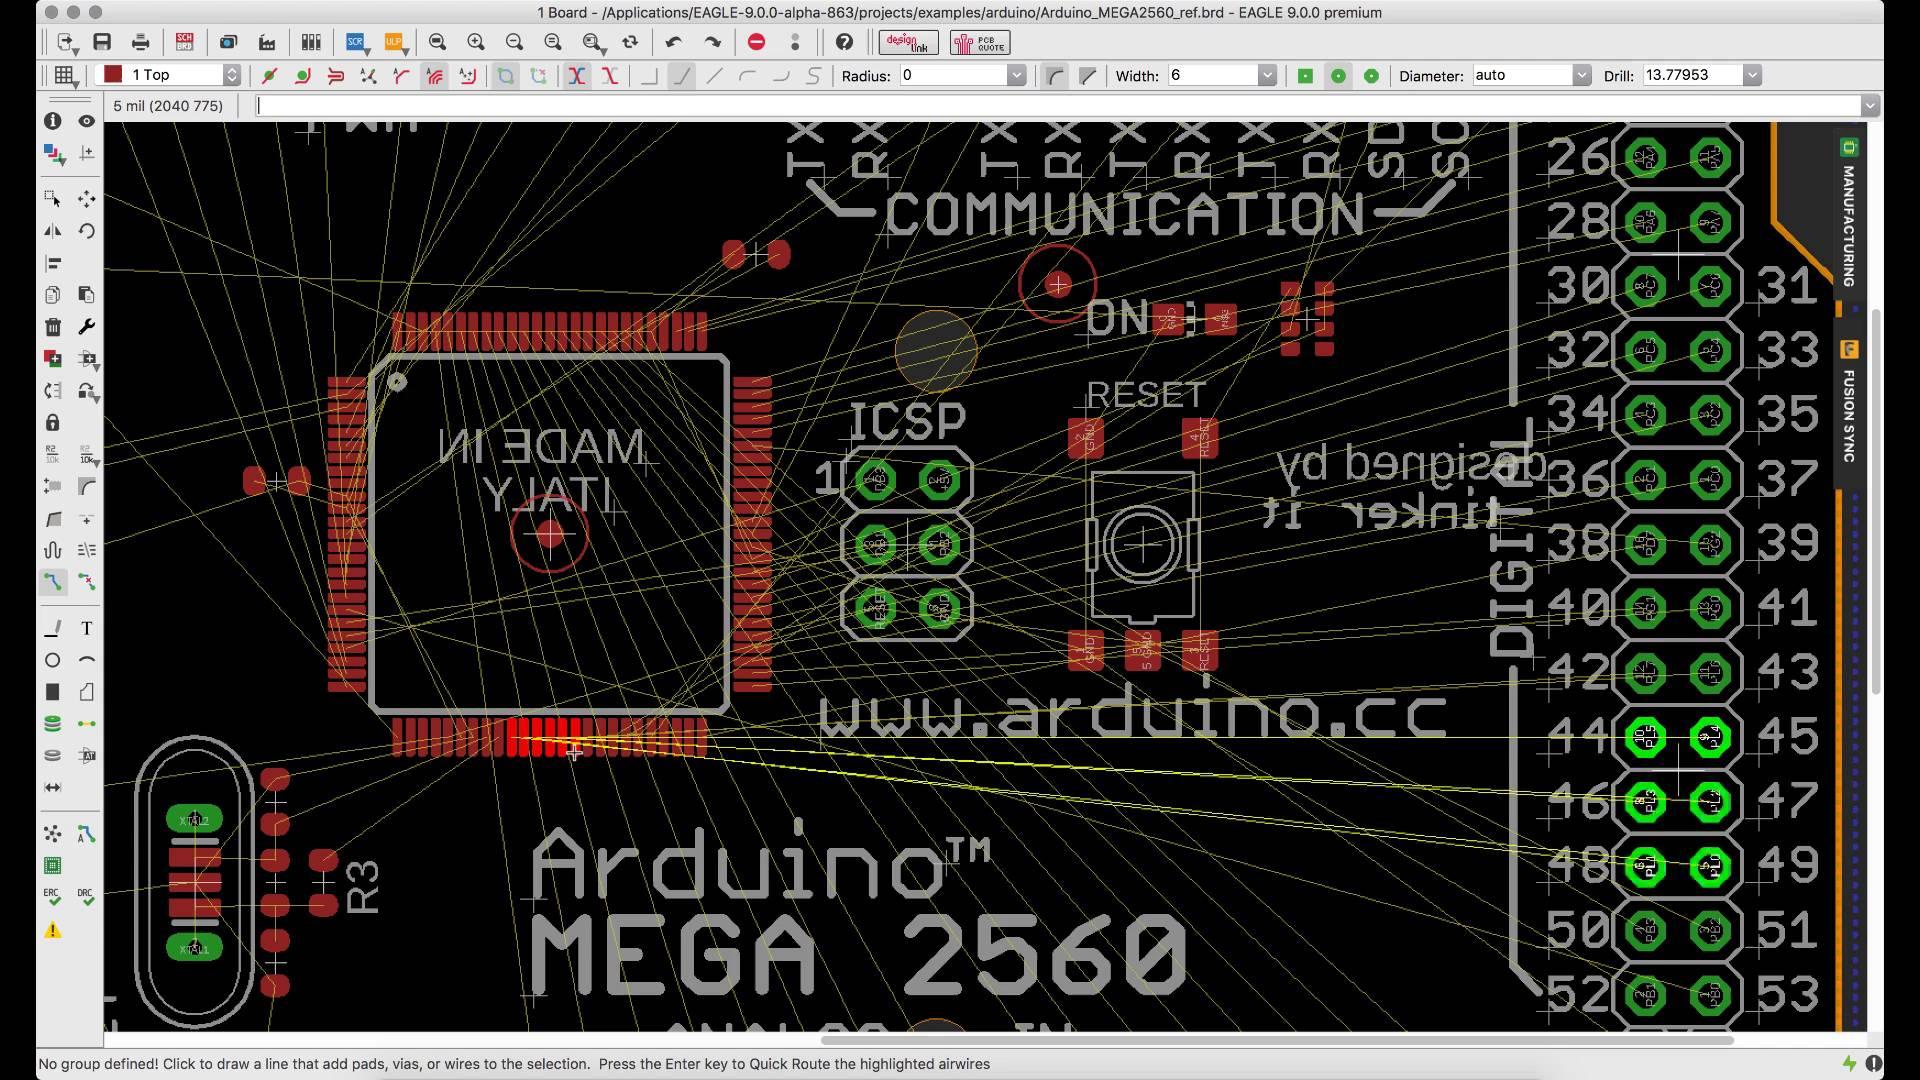 eagle pcb design software autodeskEagle Electronic Circuit Design #2